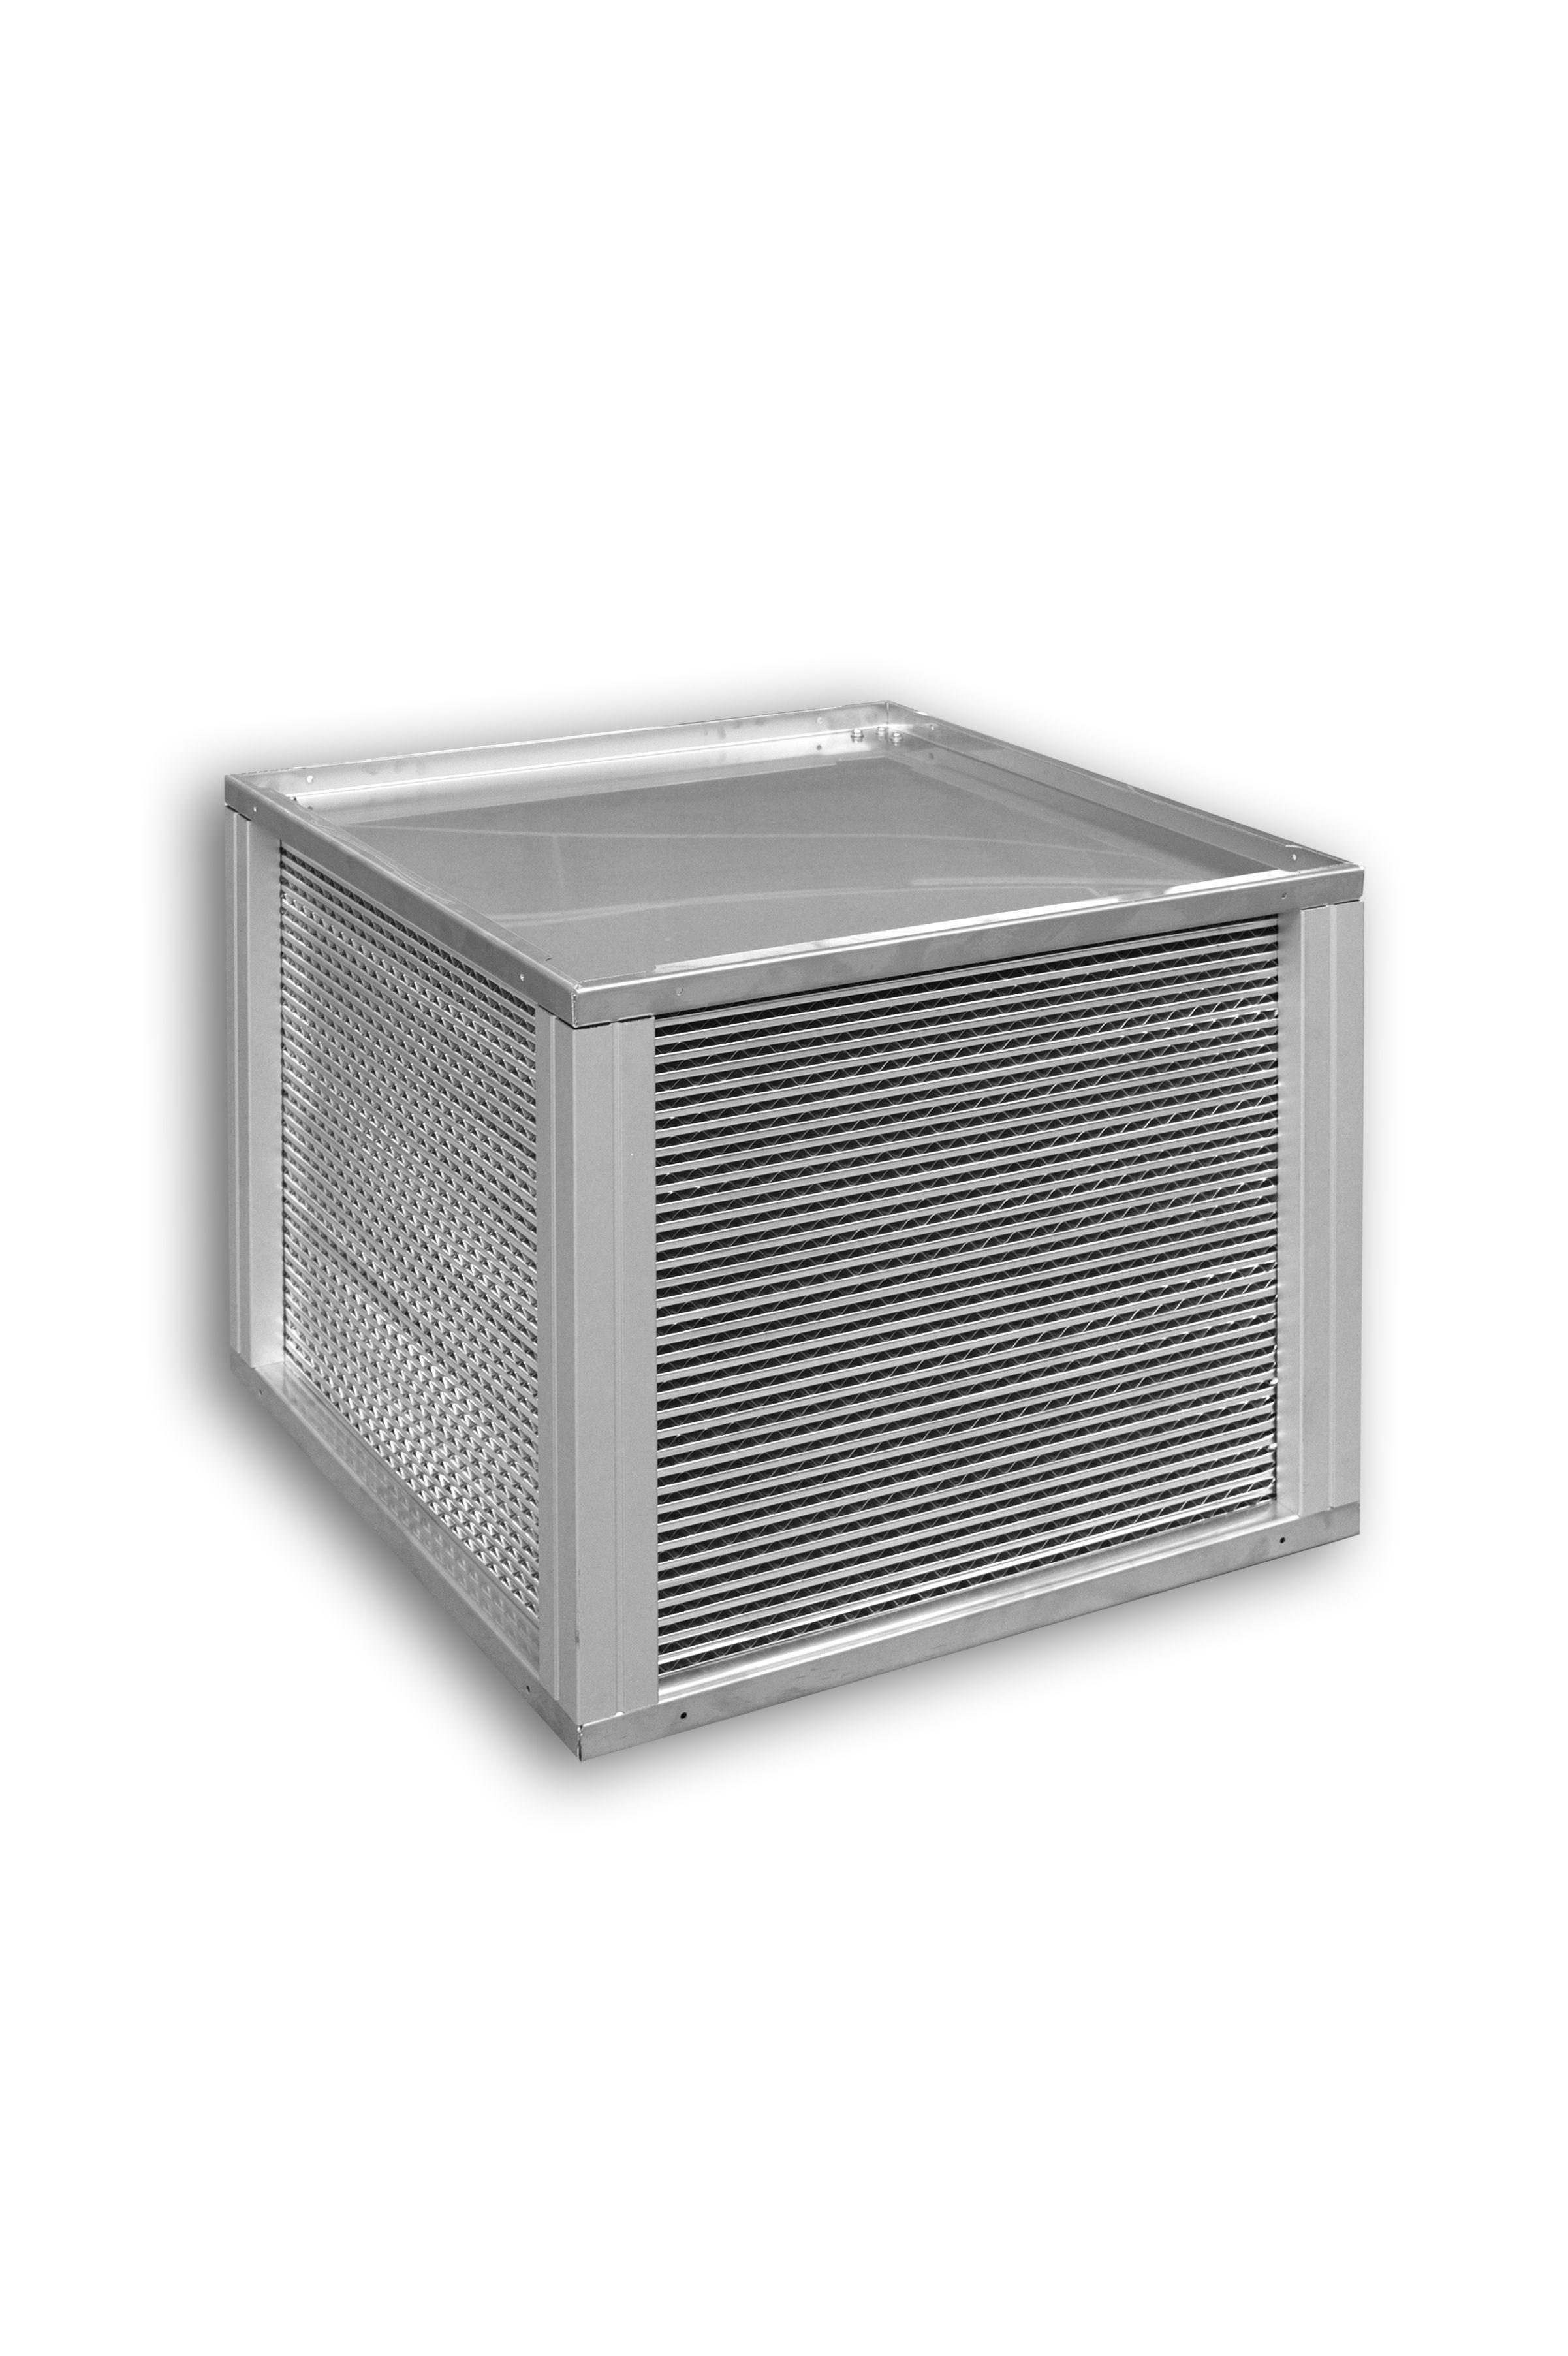 ERI Corporation S.r.L Cross-flow Plate Heat Exchanger | Cross-flow ...